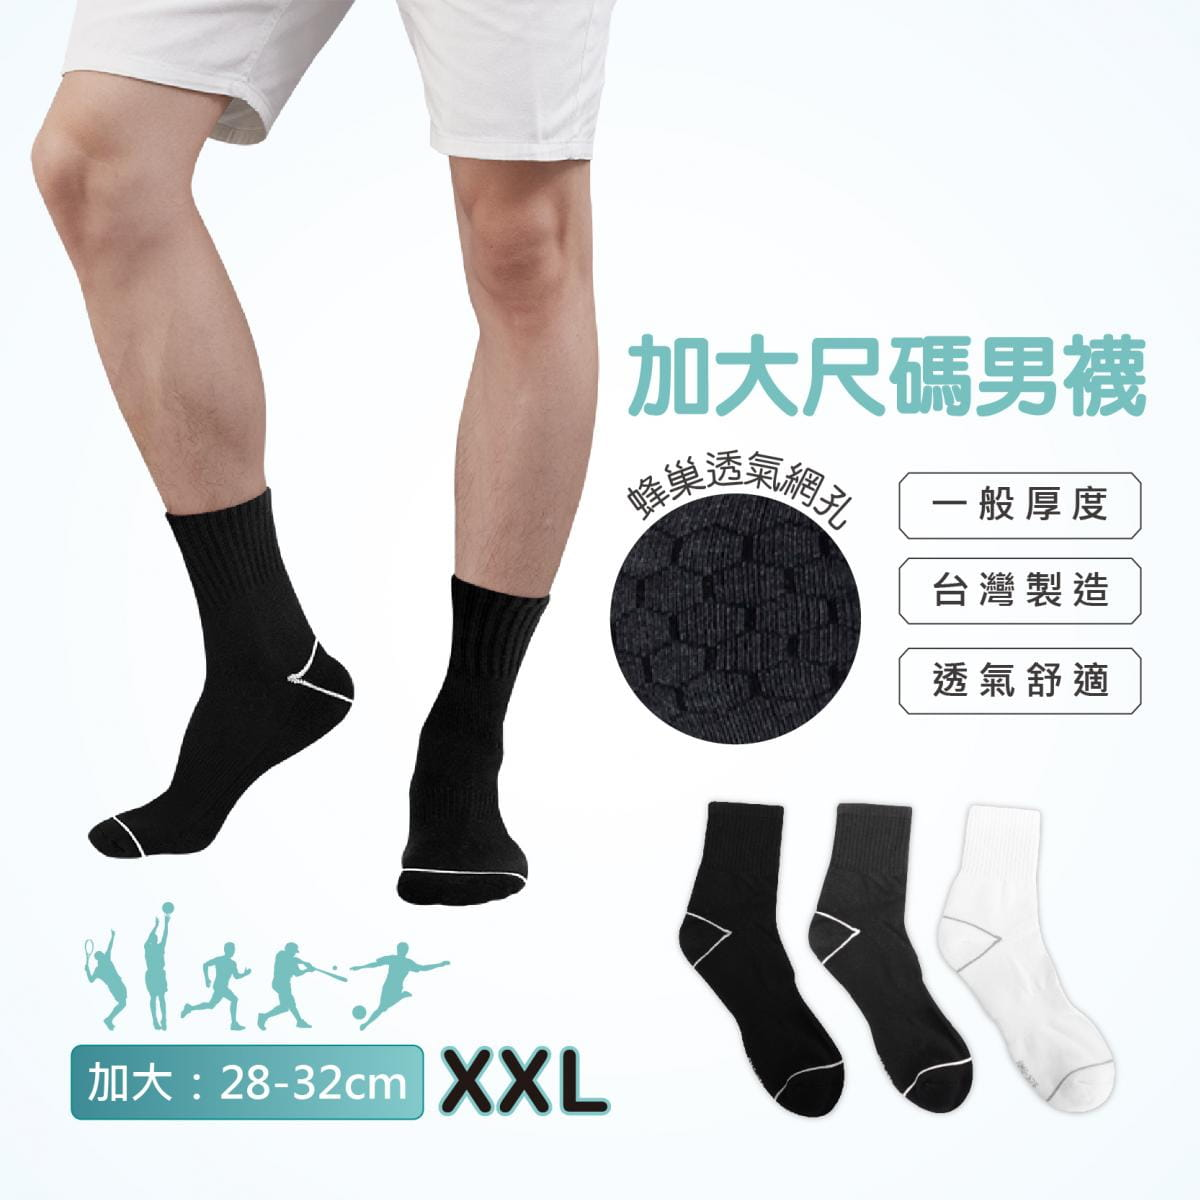 【FAV】加大尺碼男襪 0